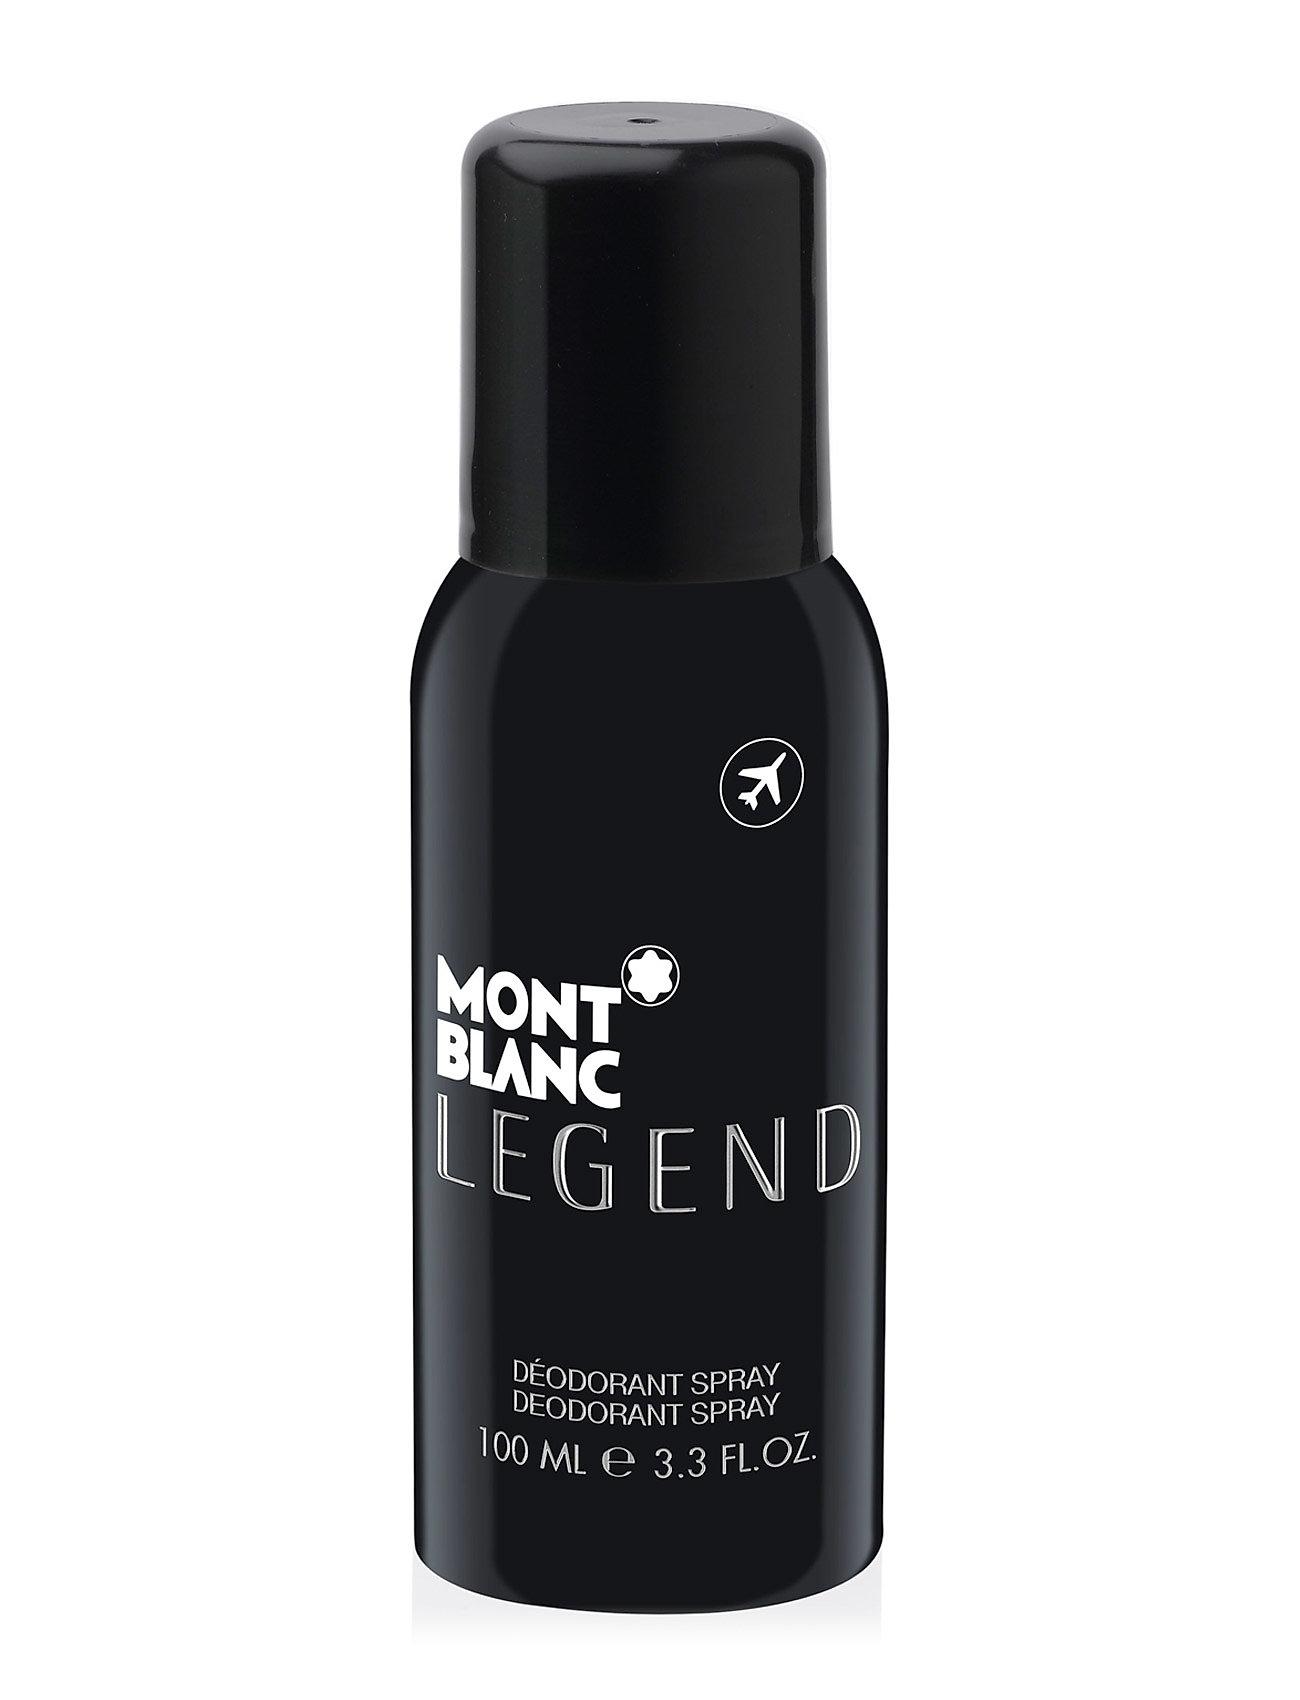 mont blanc – Legend deodorant spray på boozt.com dk